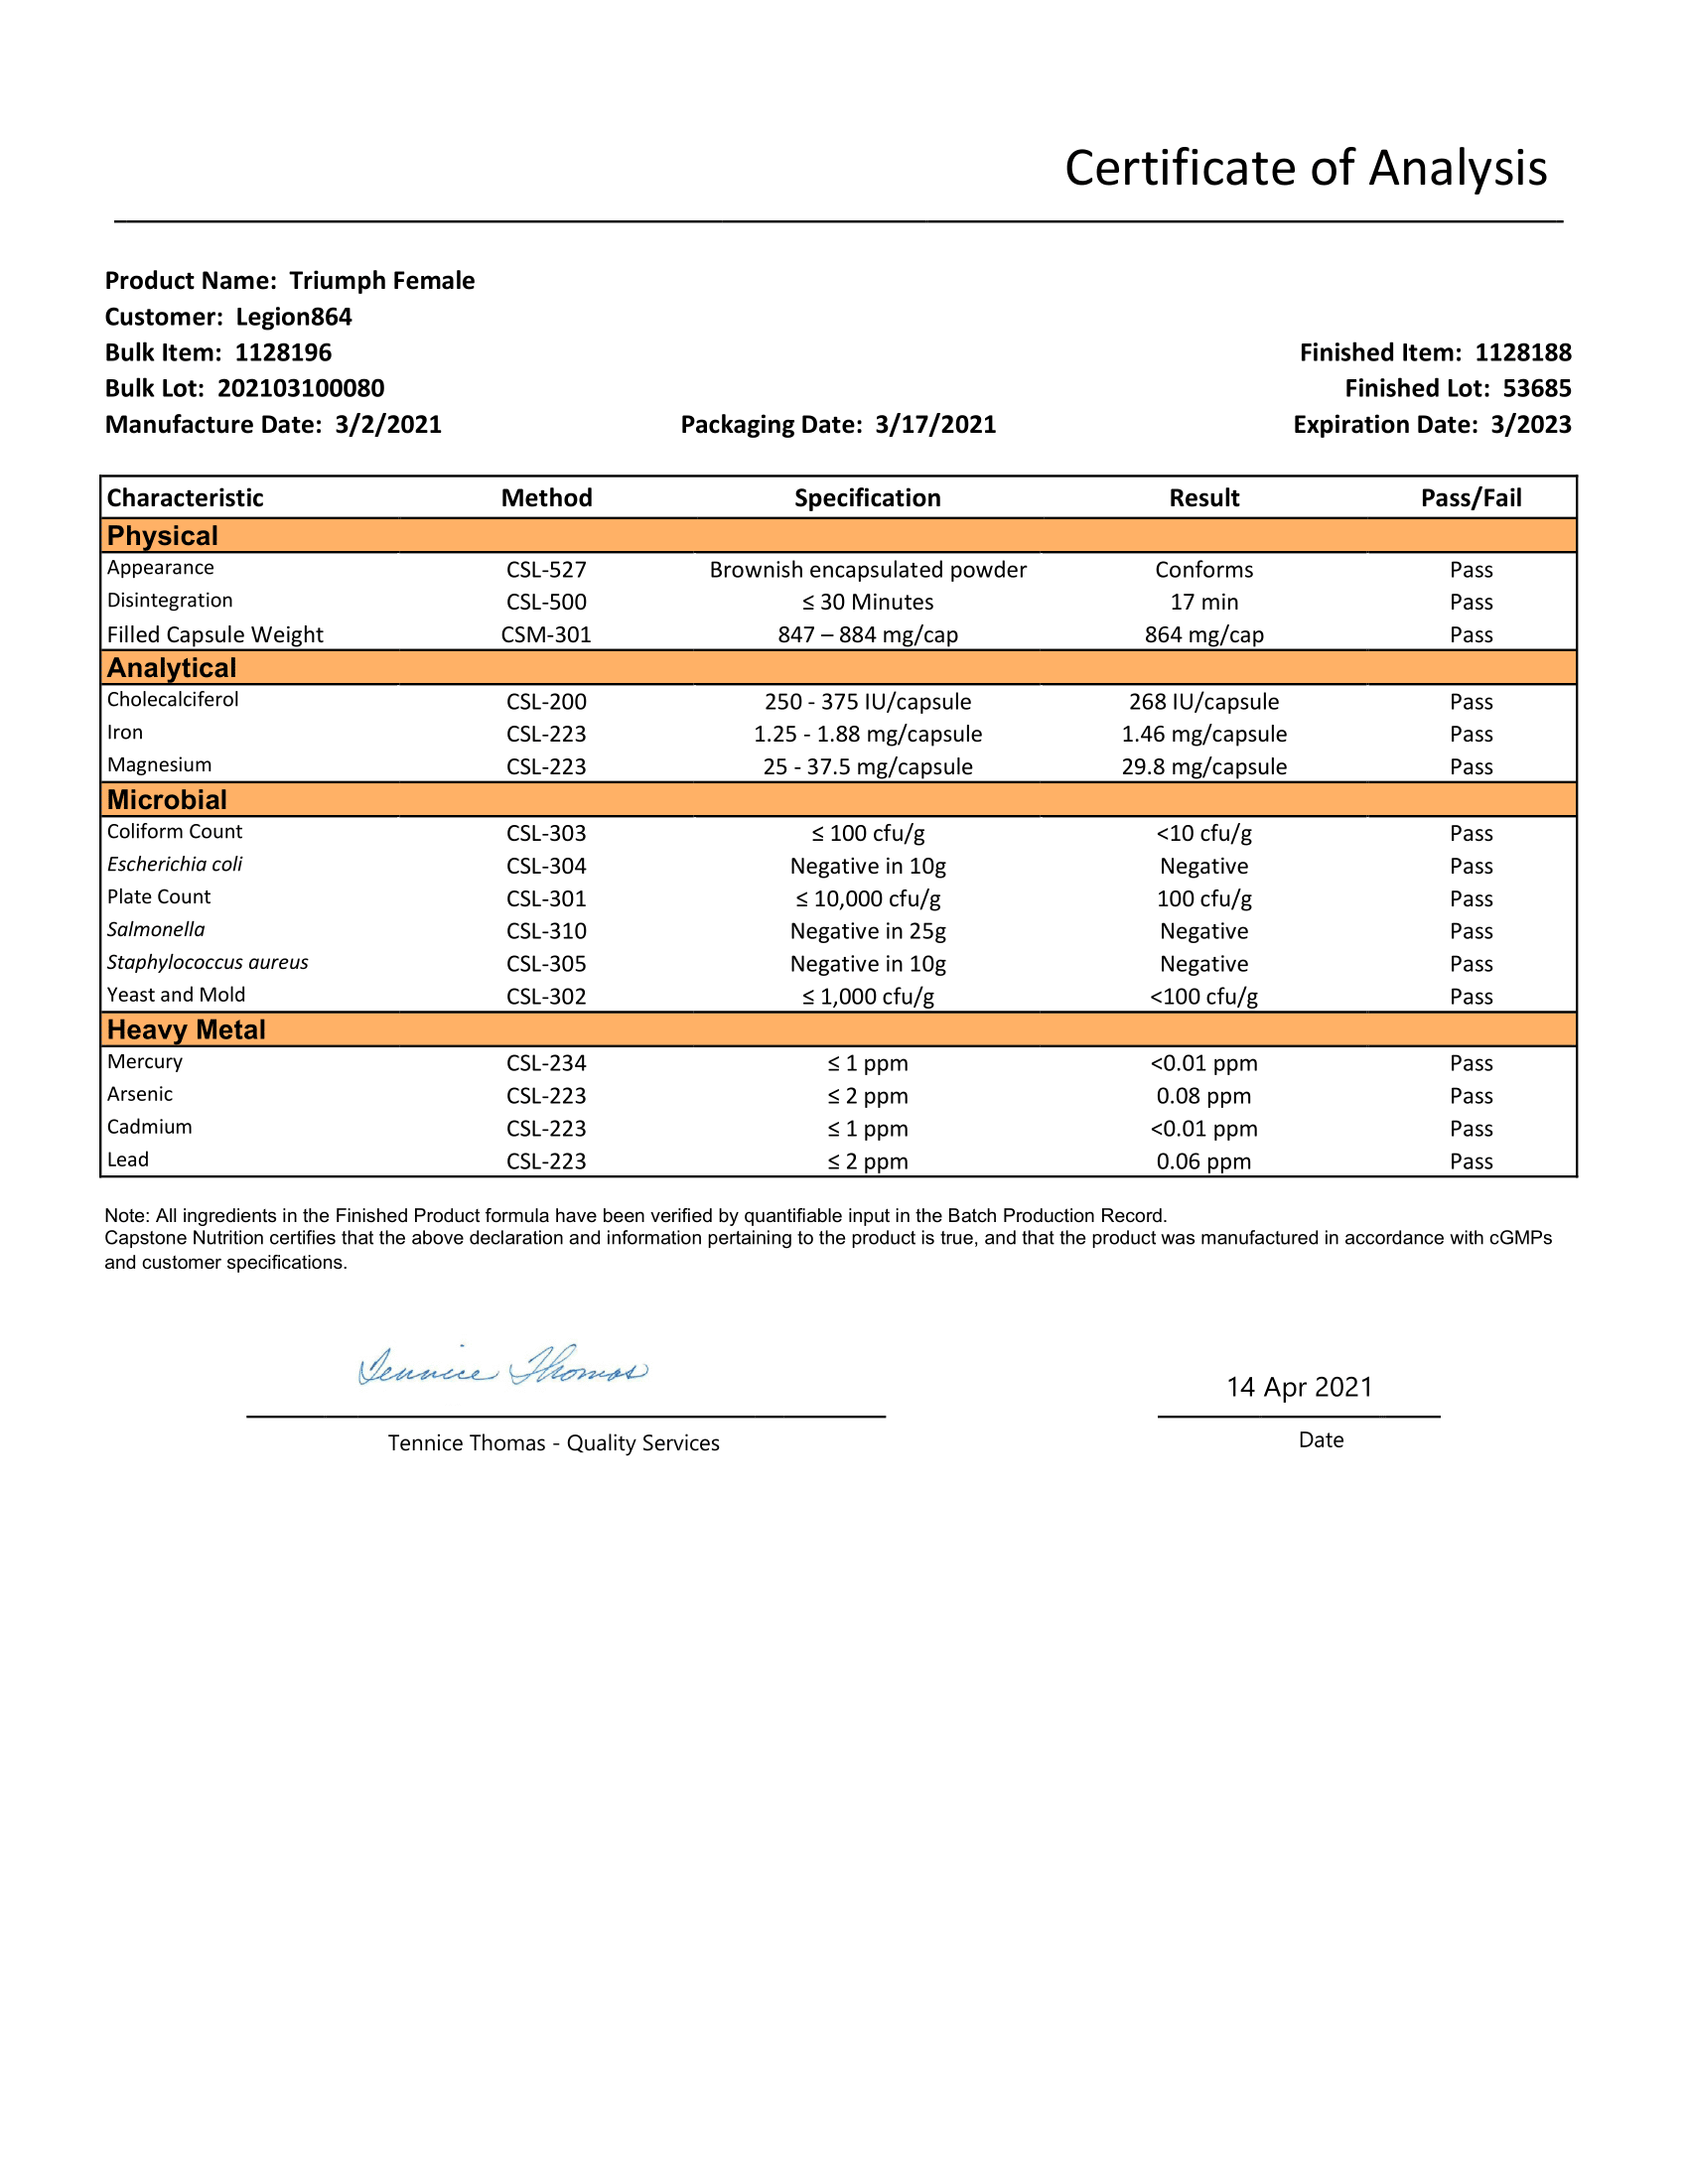 Triumph Women Lab Test Certificate